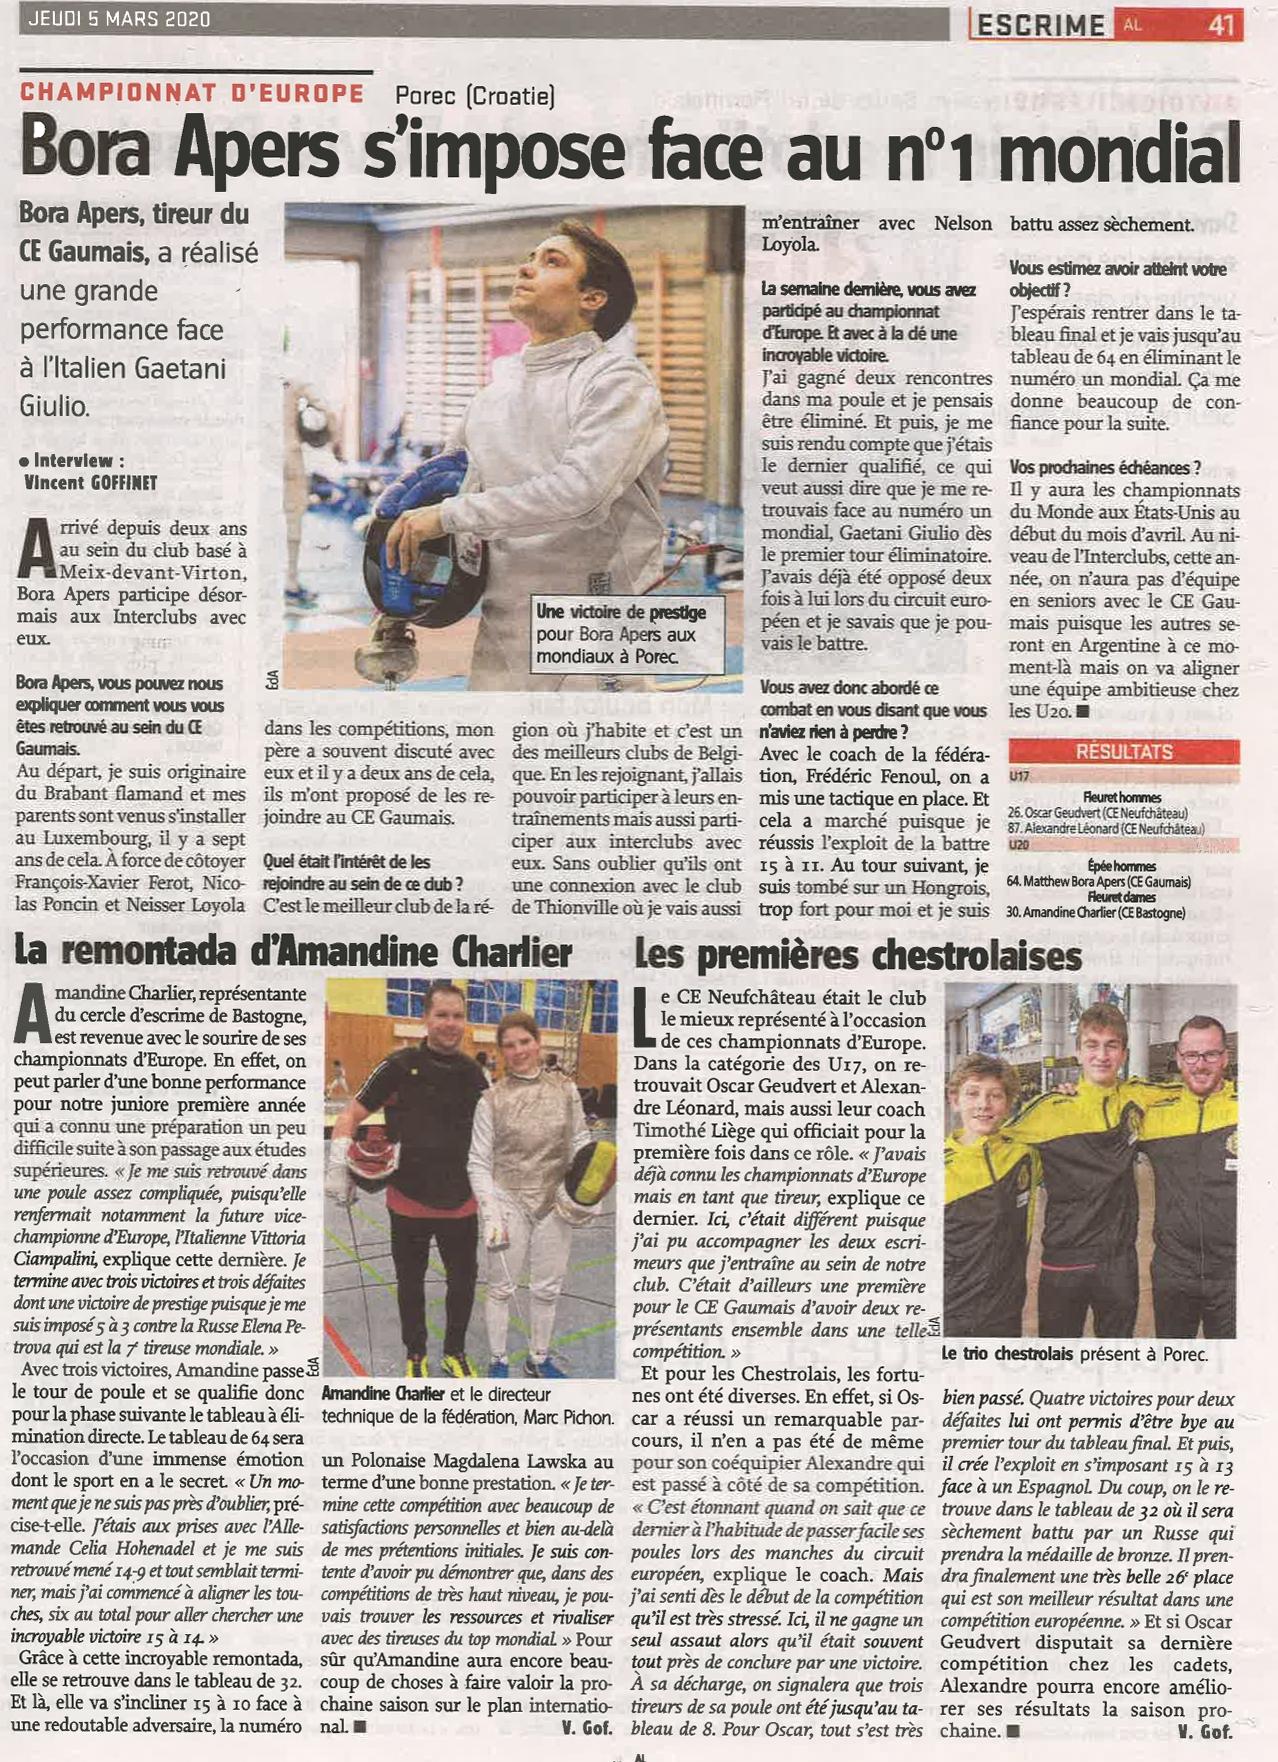 L'Avenir Luxembourg ALSport Amandine Charlier Bora Apers Escrime Championnats d'Europe Porec